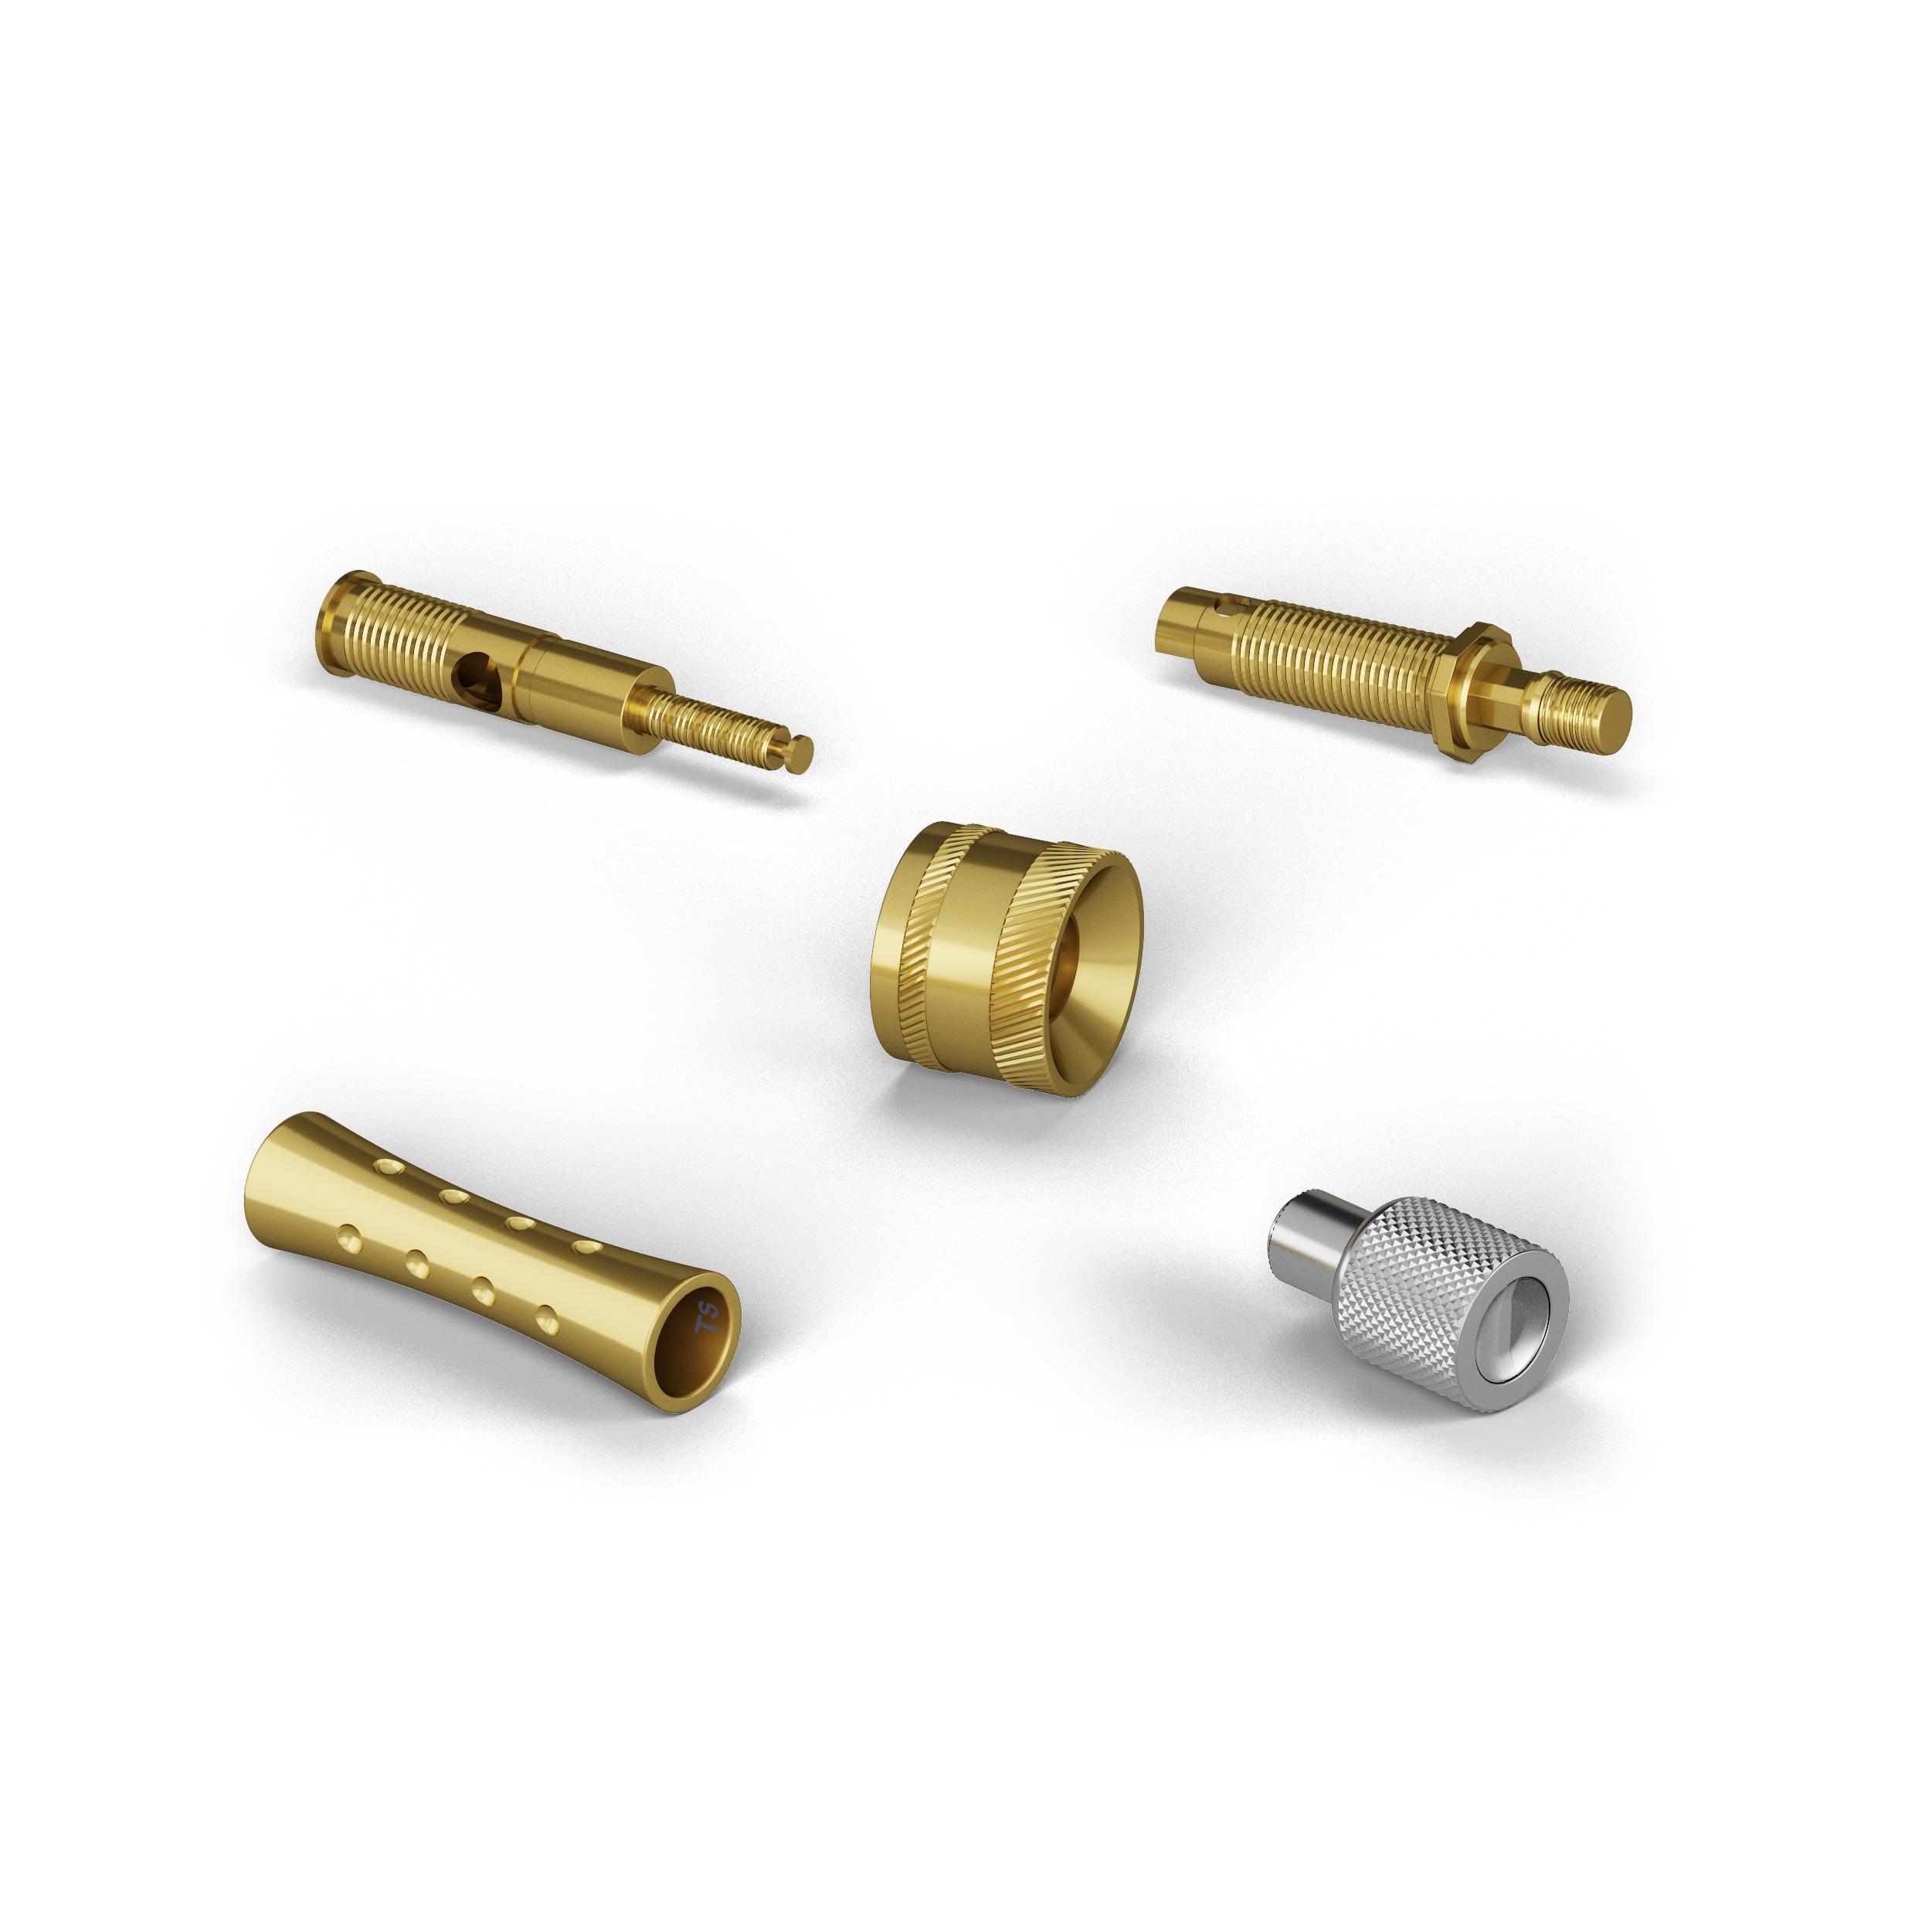 CNC Lathes, Precision Turned Parts